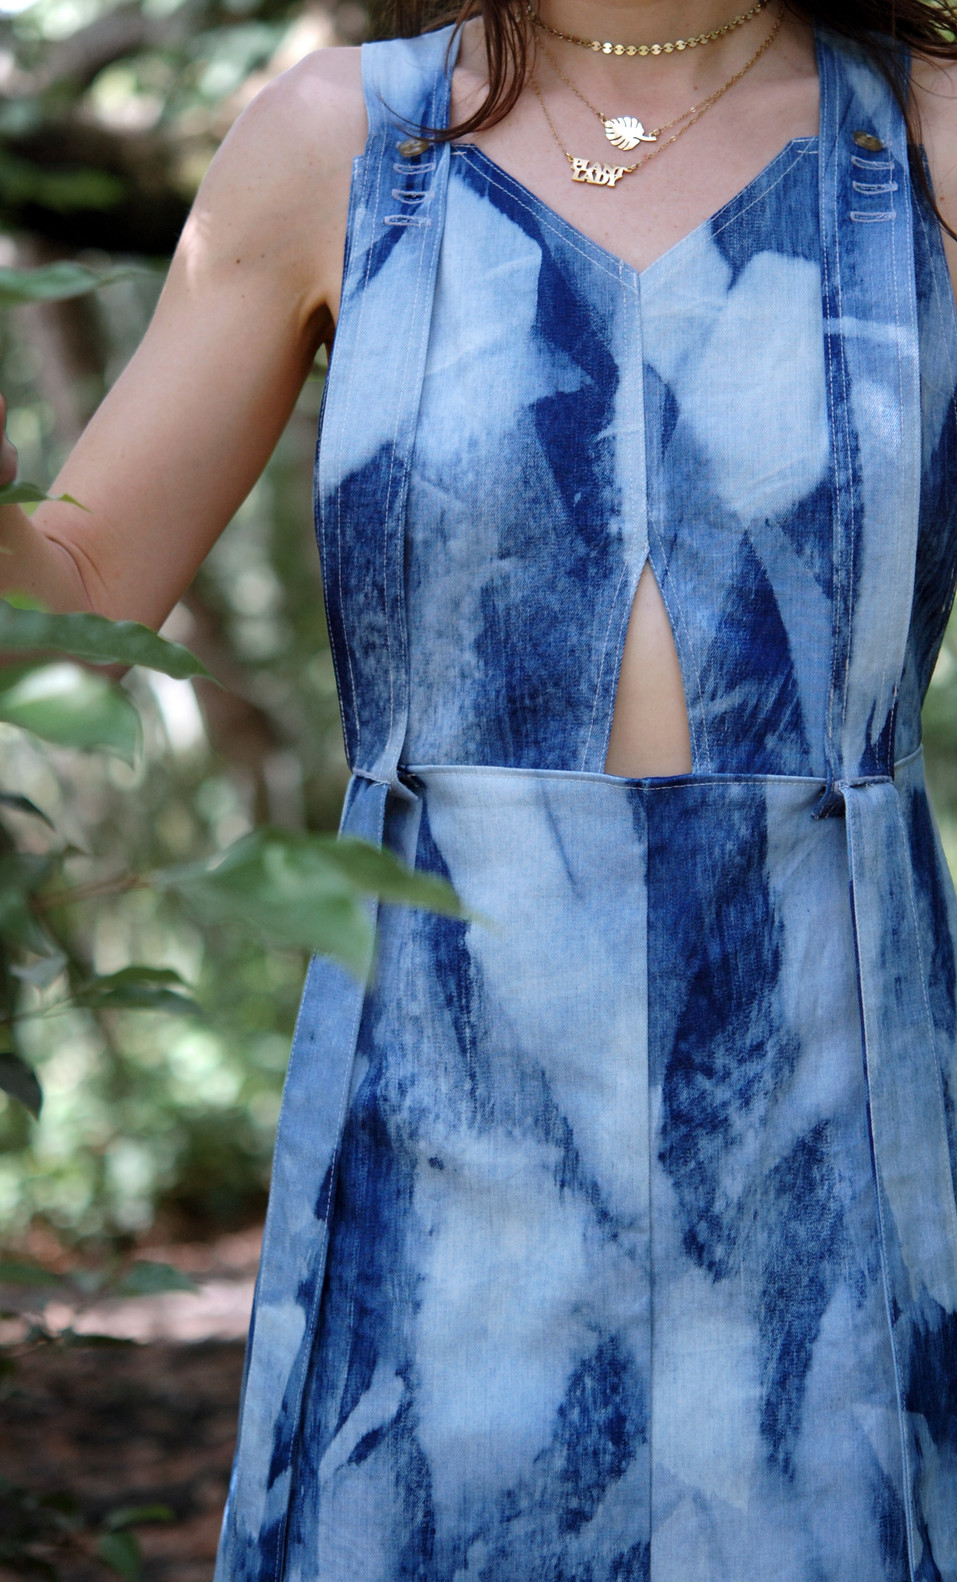 painted blue denim dress